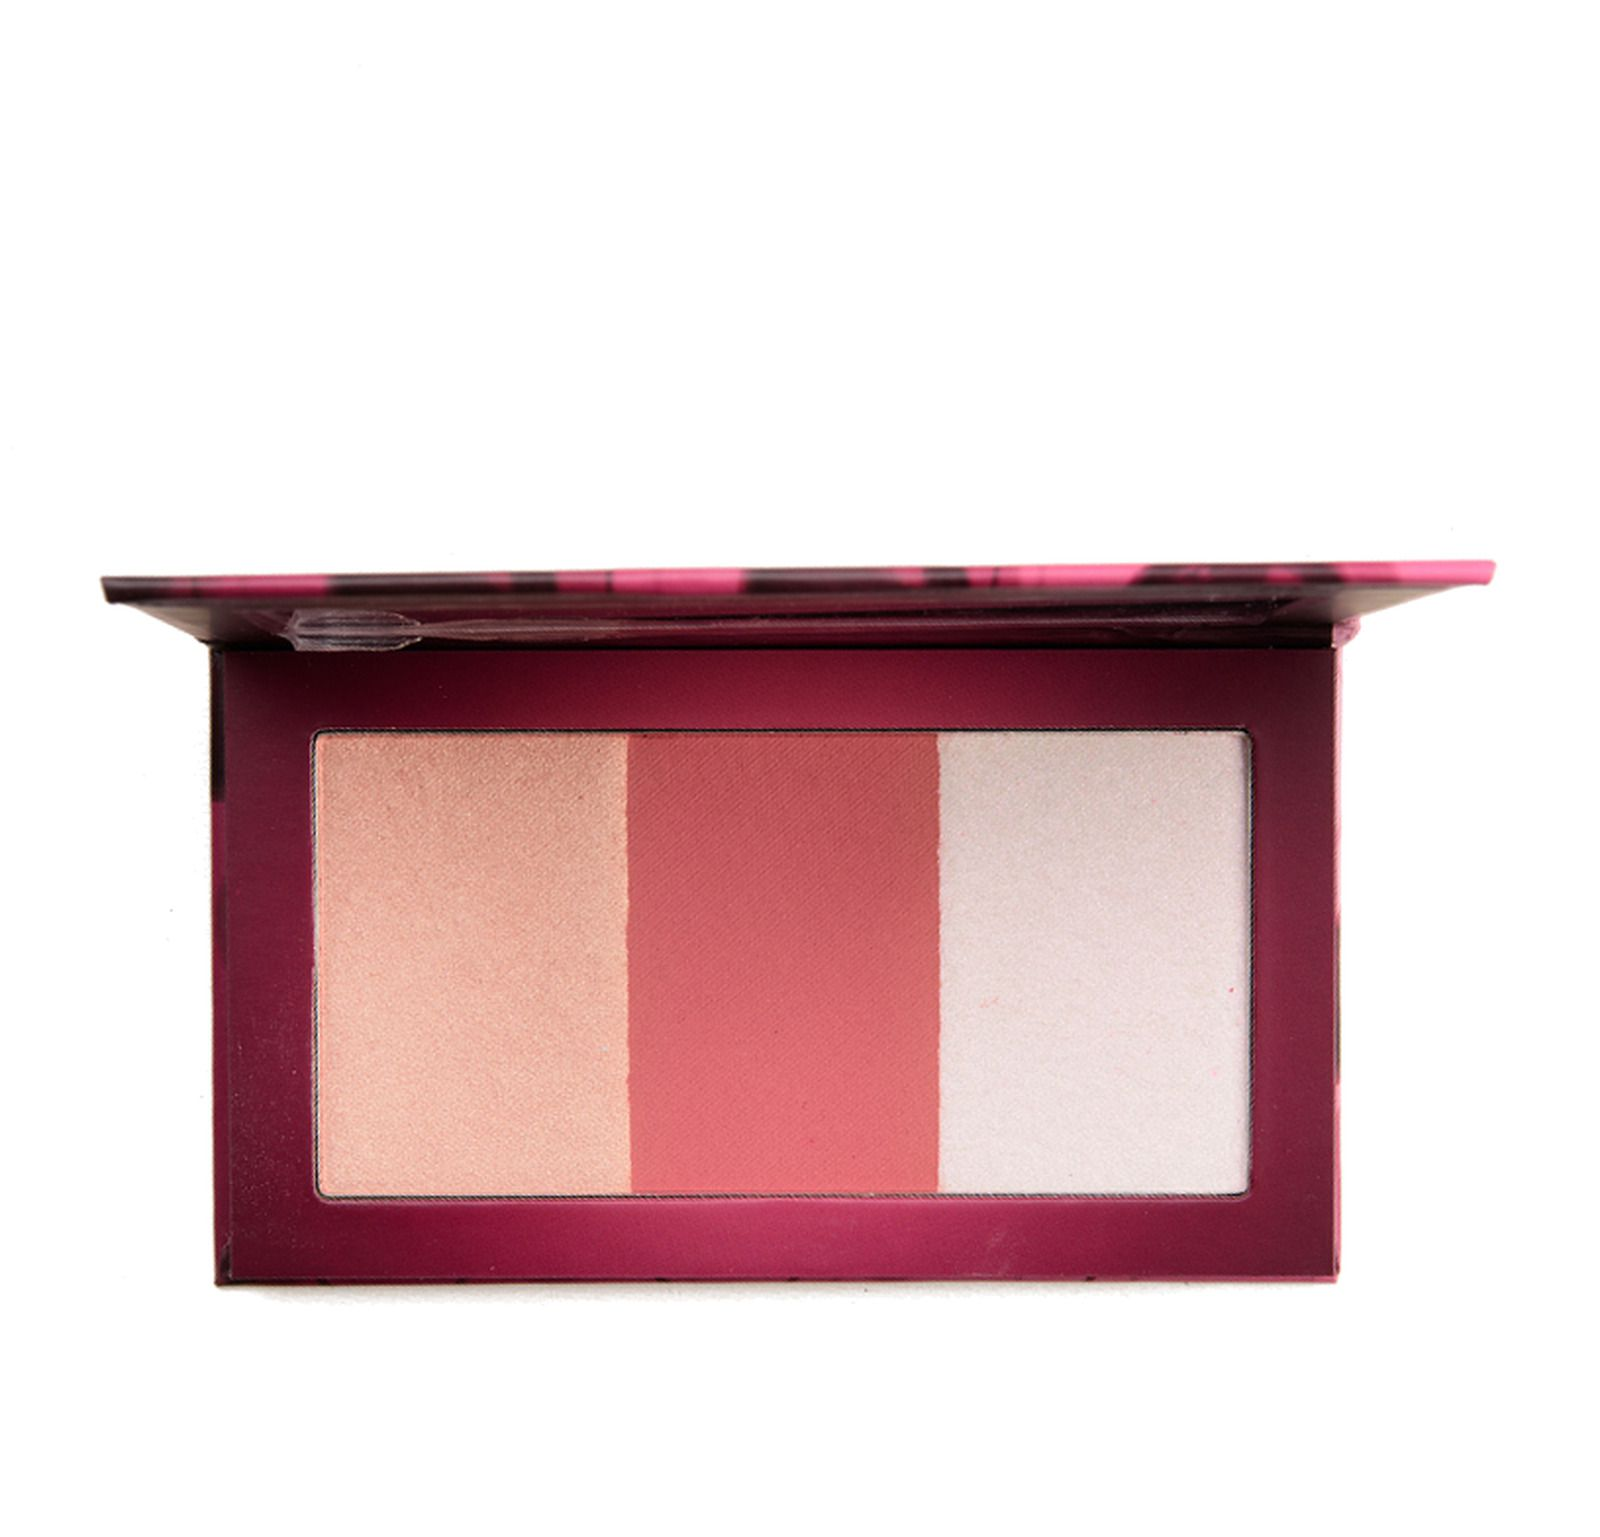 Paleta Naked Cherry Highlighter & Blush URBAN DECAY